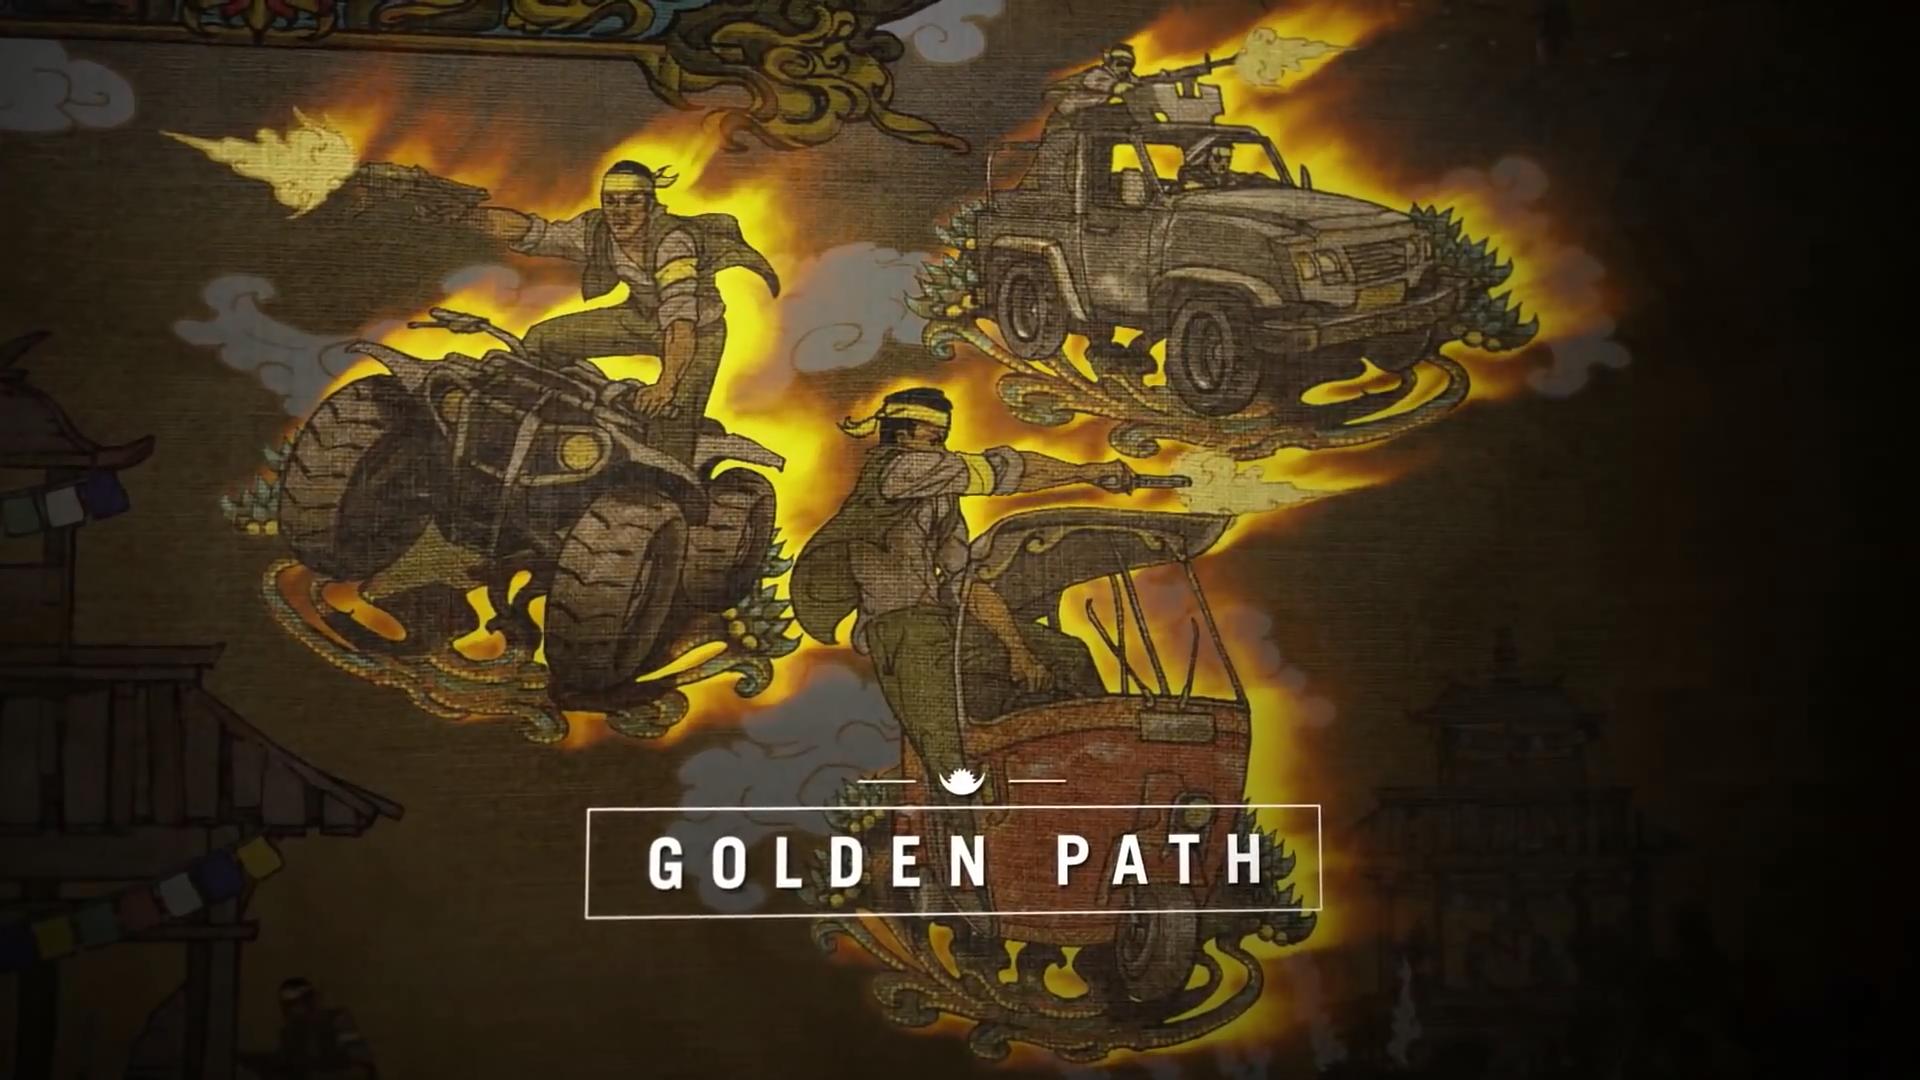 Golden Path | Far Cry Wiki | FANDOM powered by Wikia